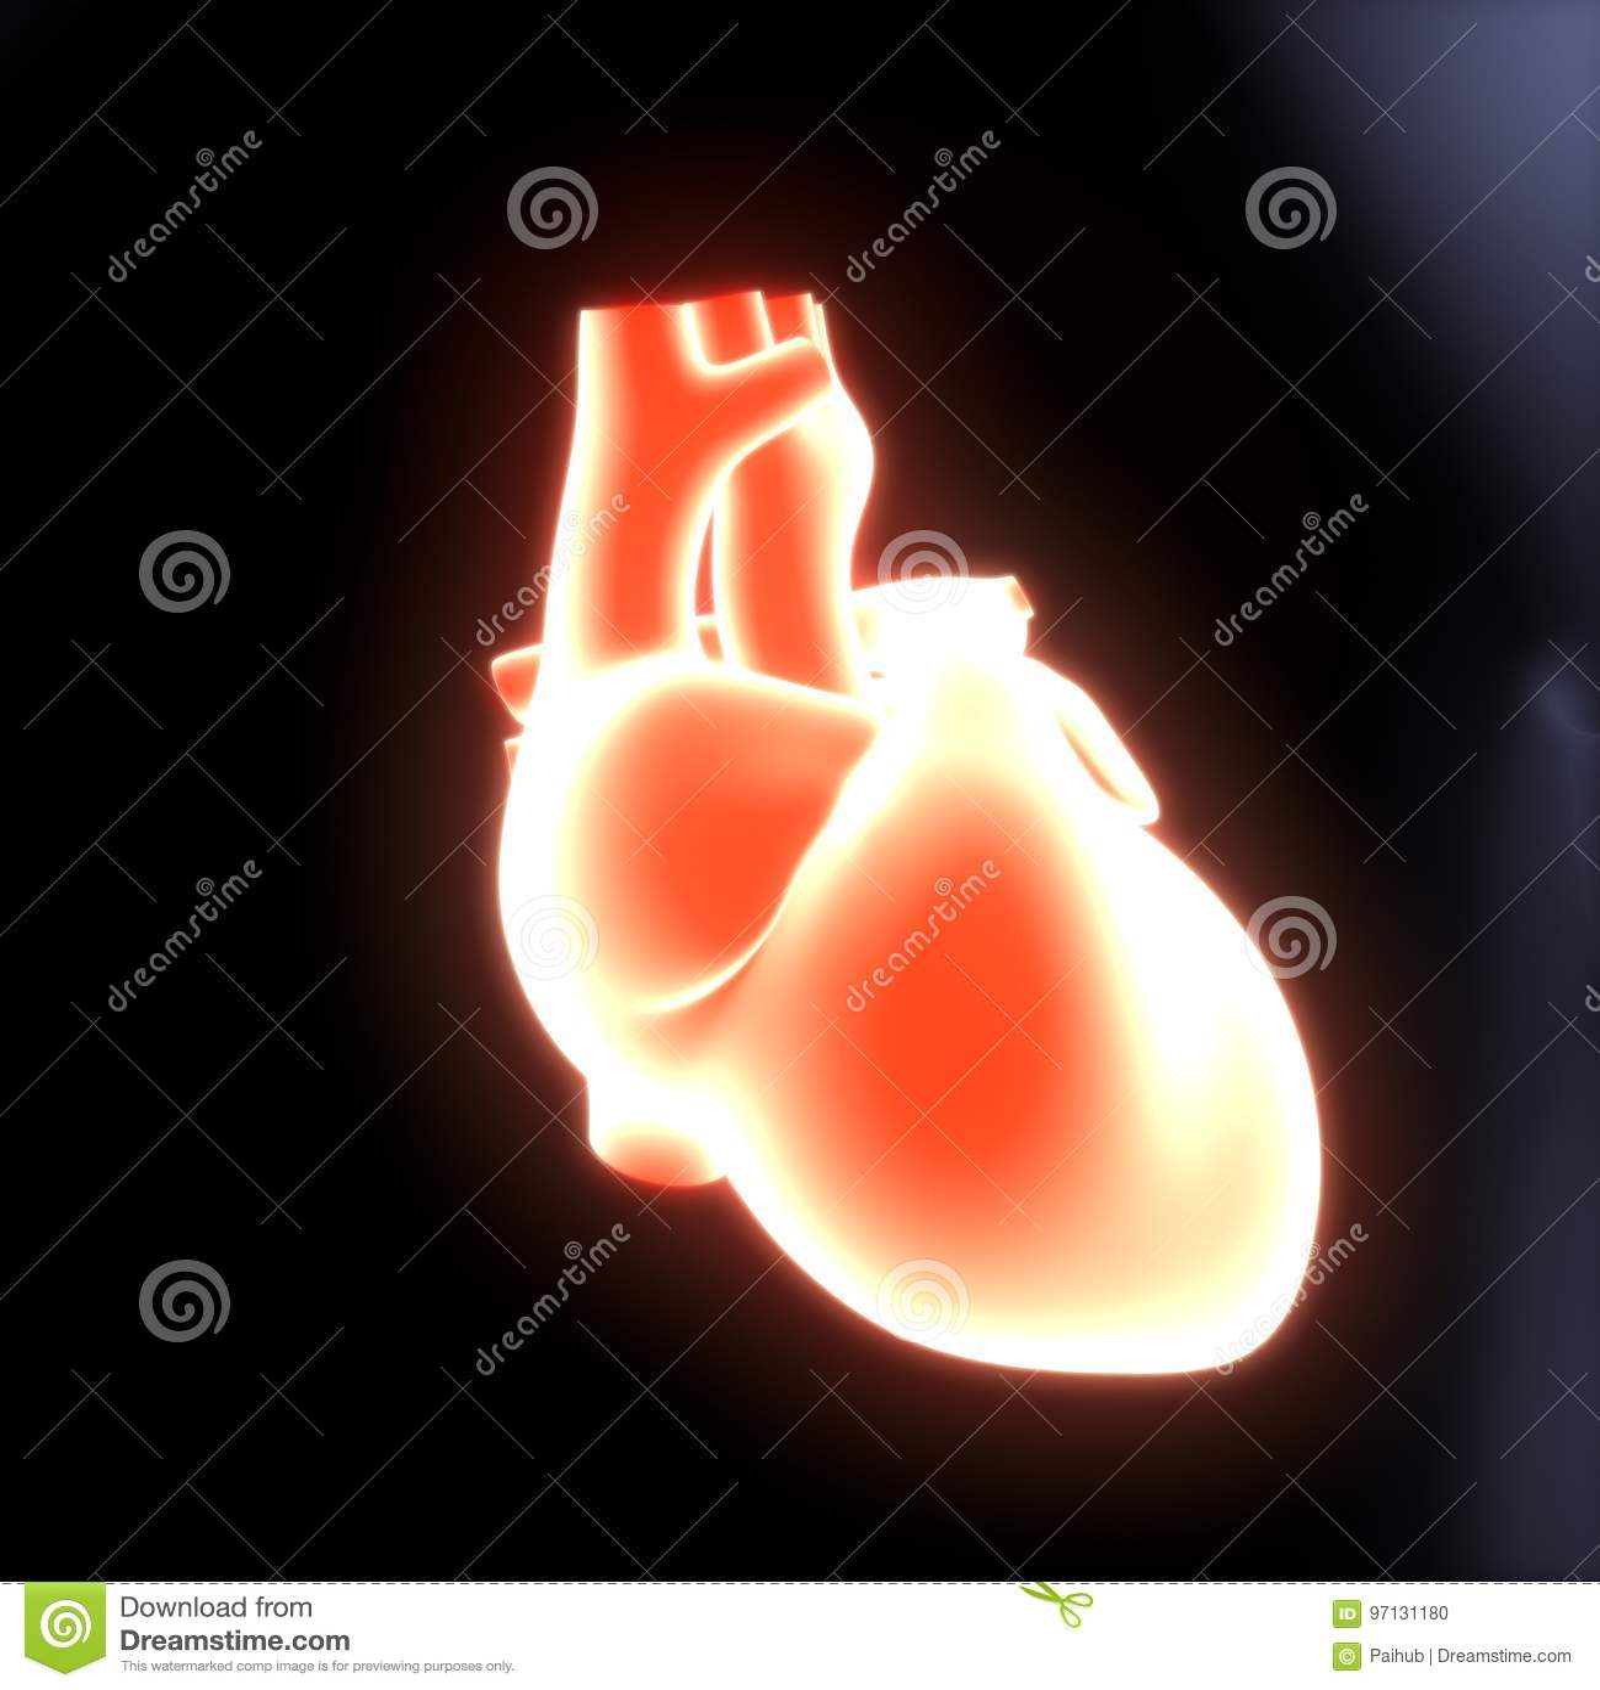 3d Illustration Of Human Body Heart Anatomy Stock Illustration